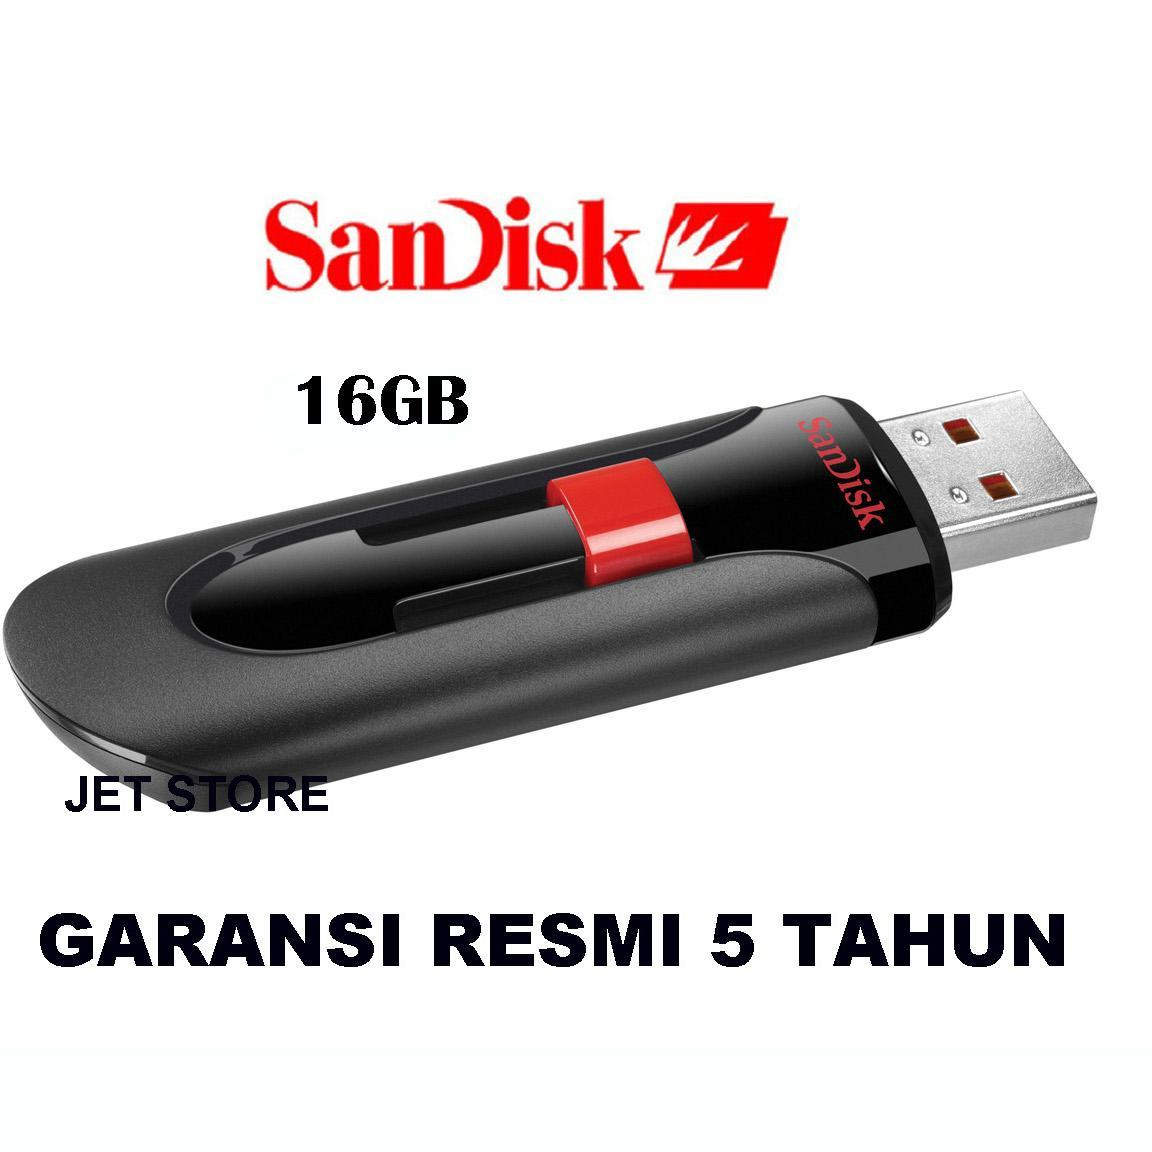 Kelebihan Sandisk Flashdisk Cruzer Blade 16 Gb Terkini Daftar Switch Cz52 8 Glide Cz60 Hitam